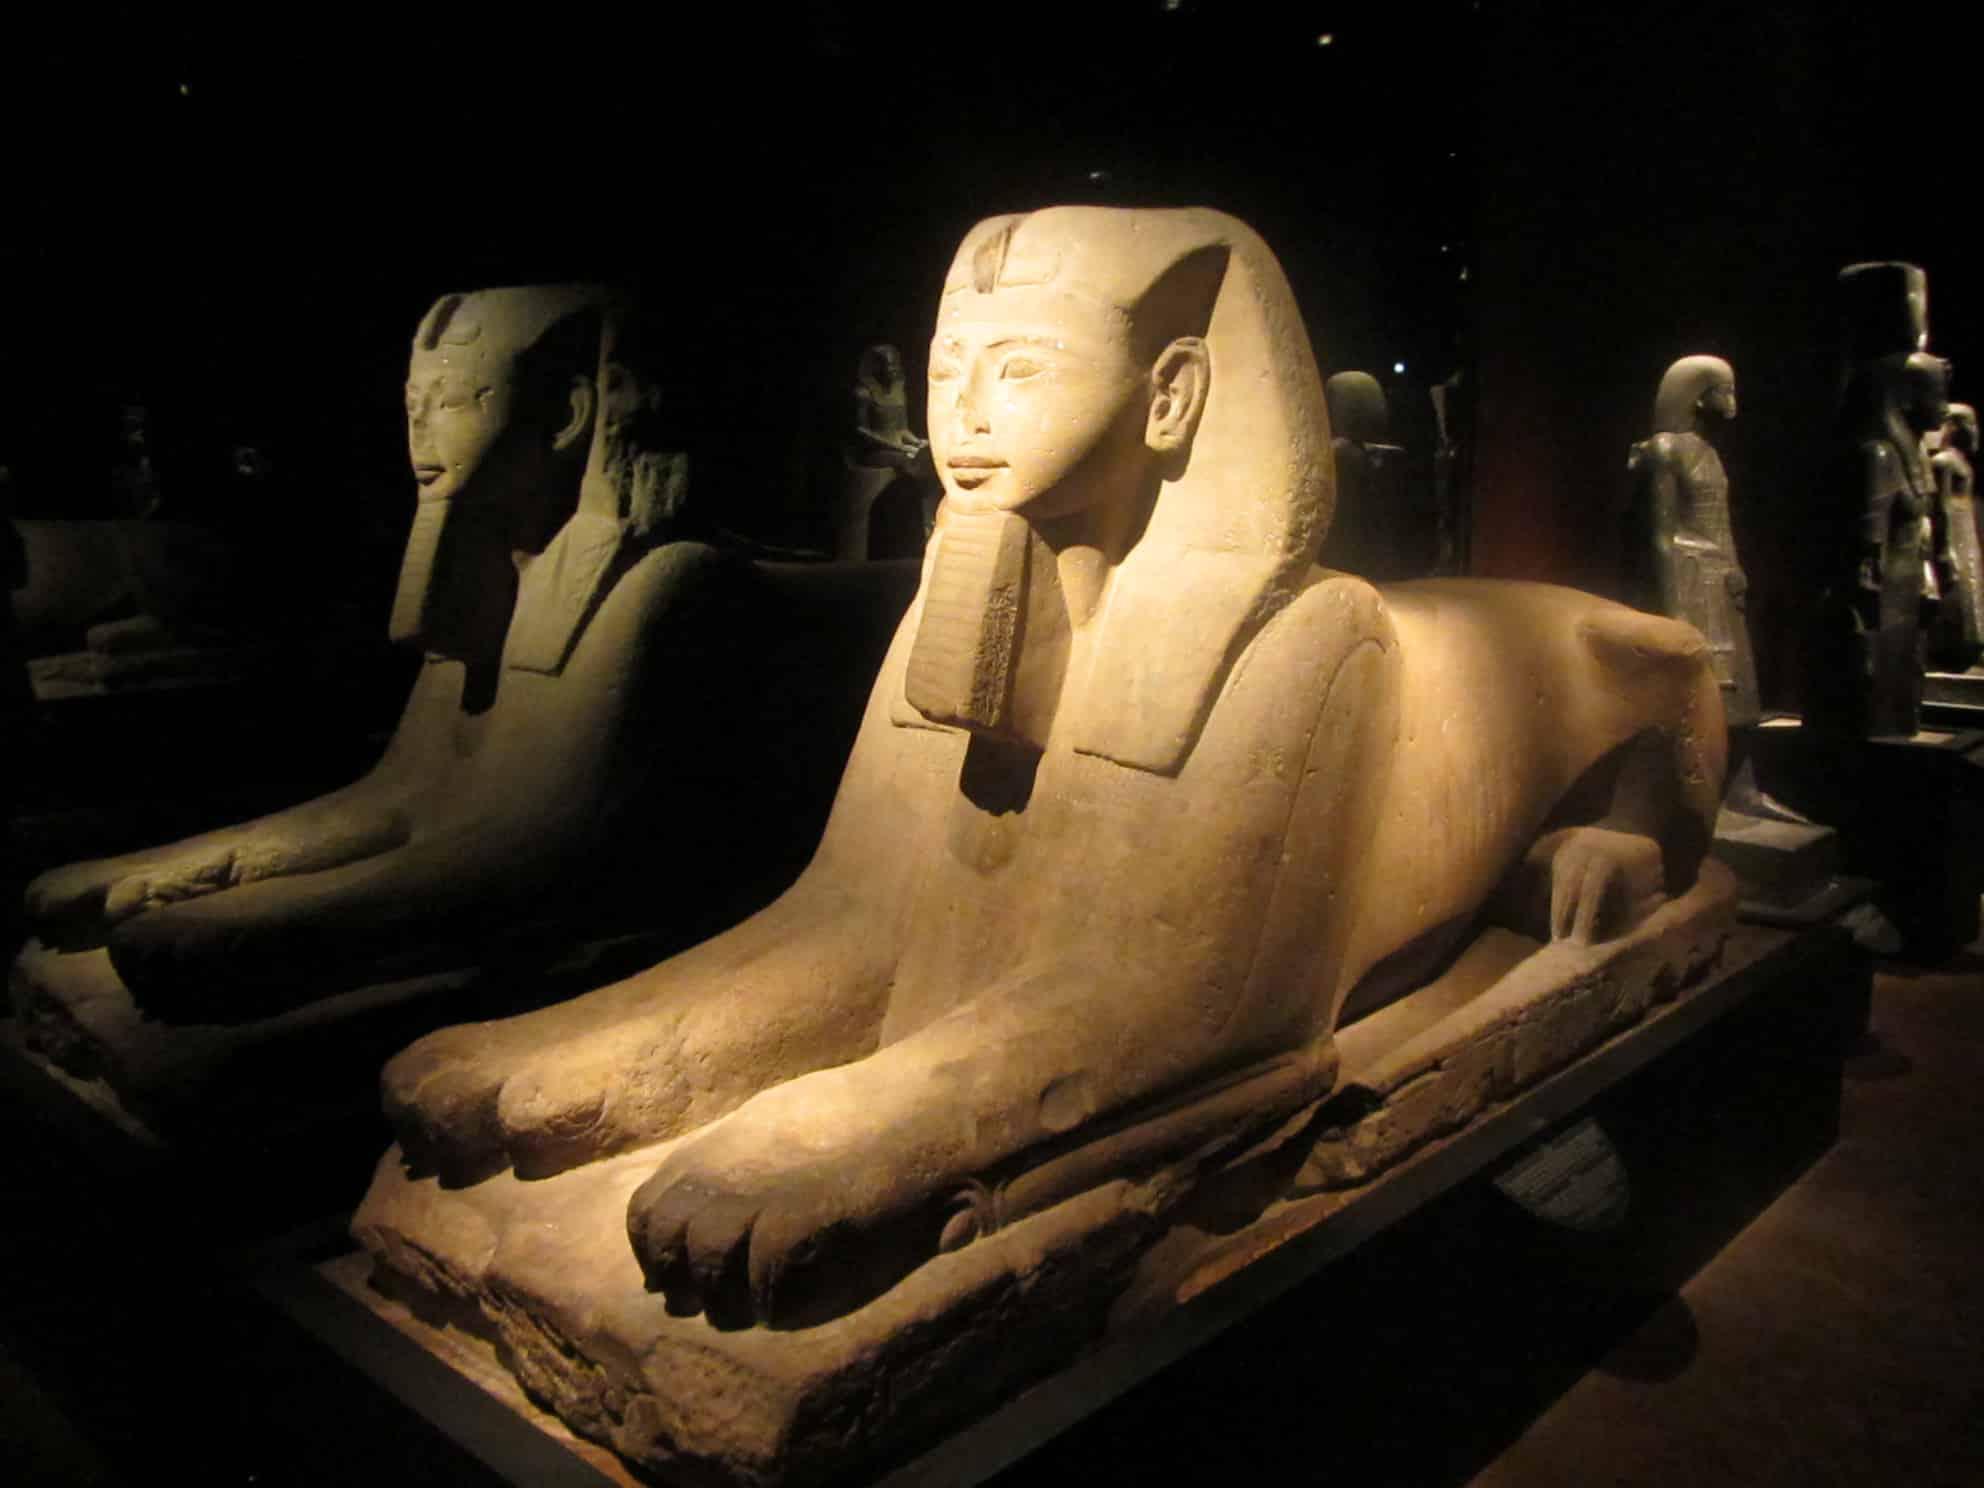 Slot Sphinx Gratis Online senza registrazione: lista casinò